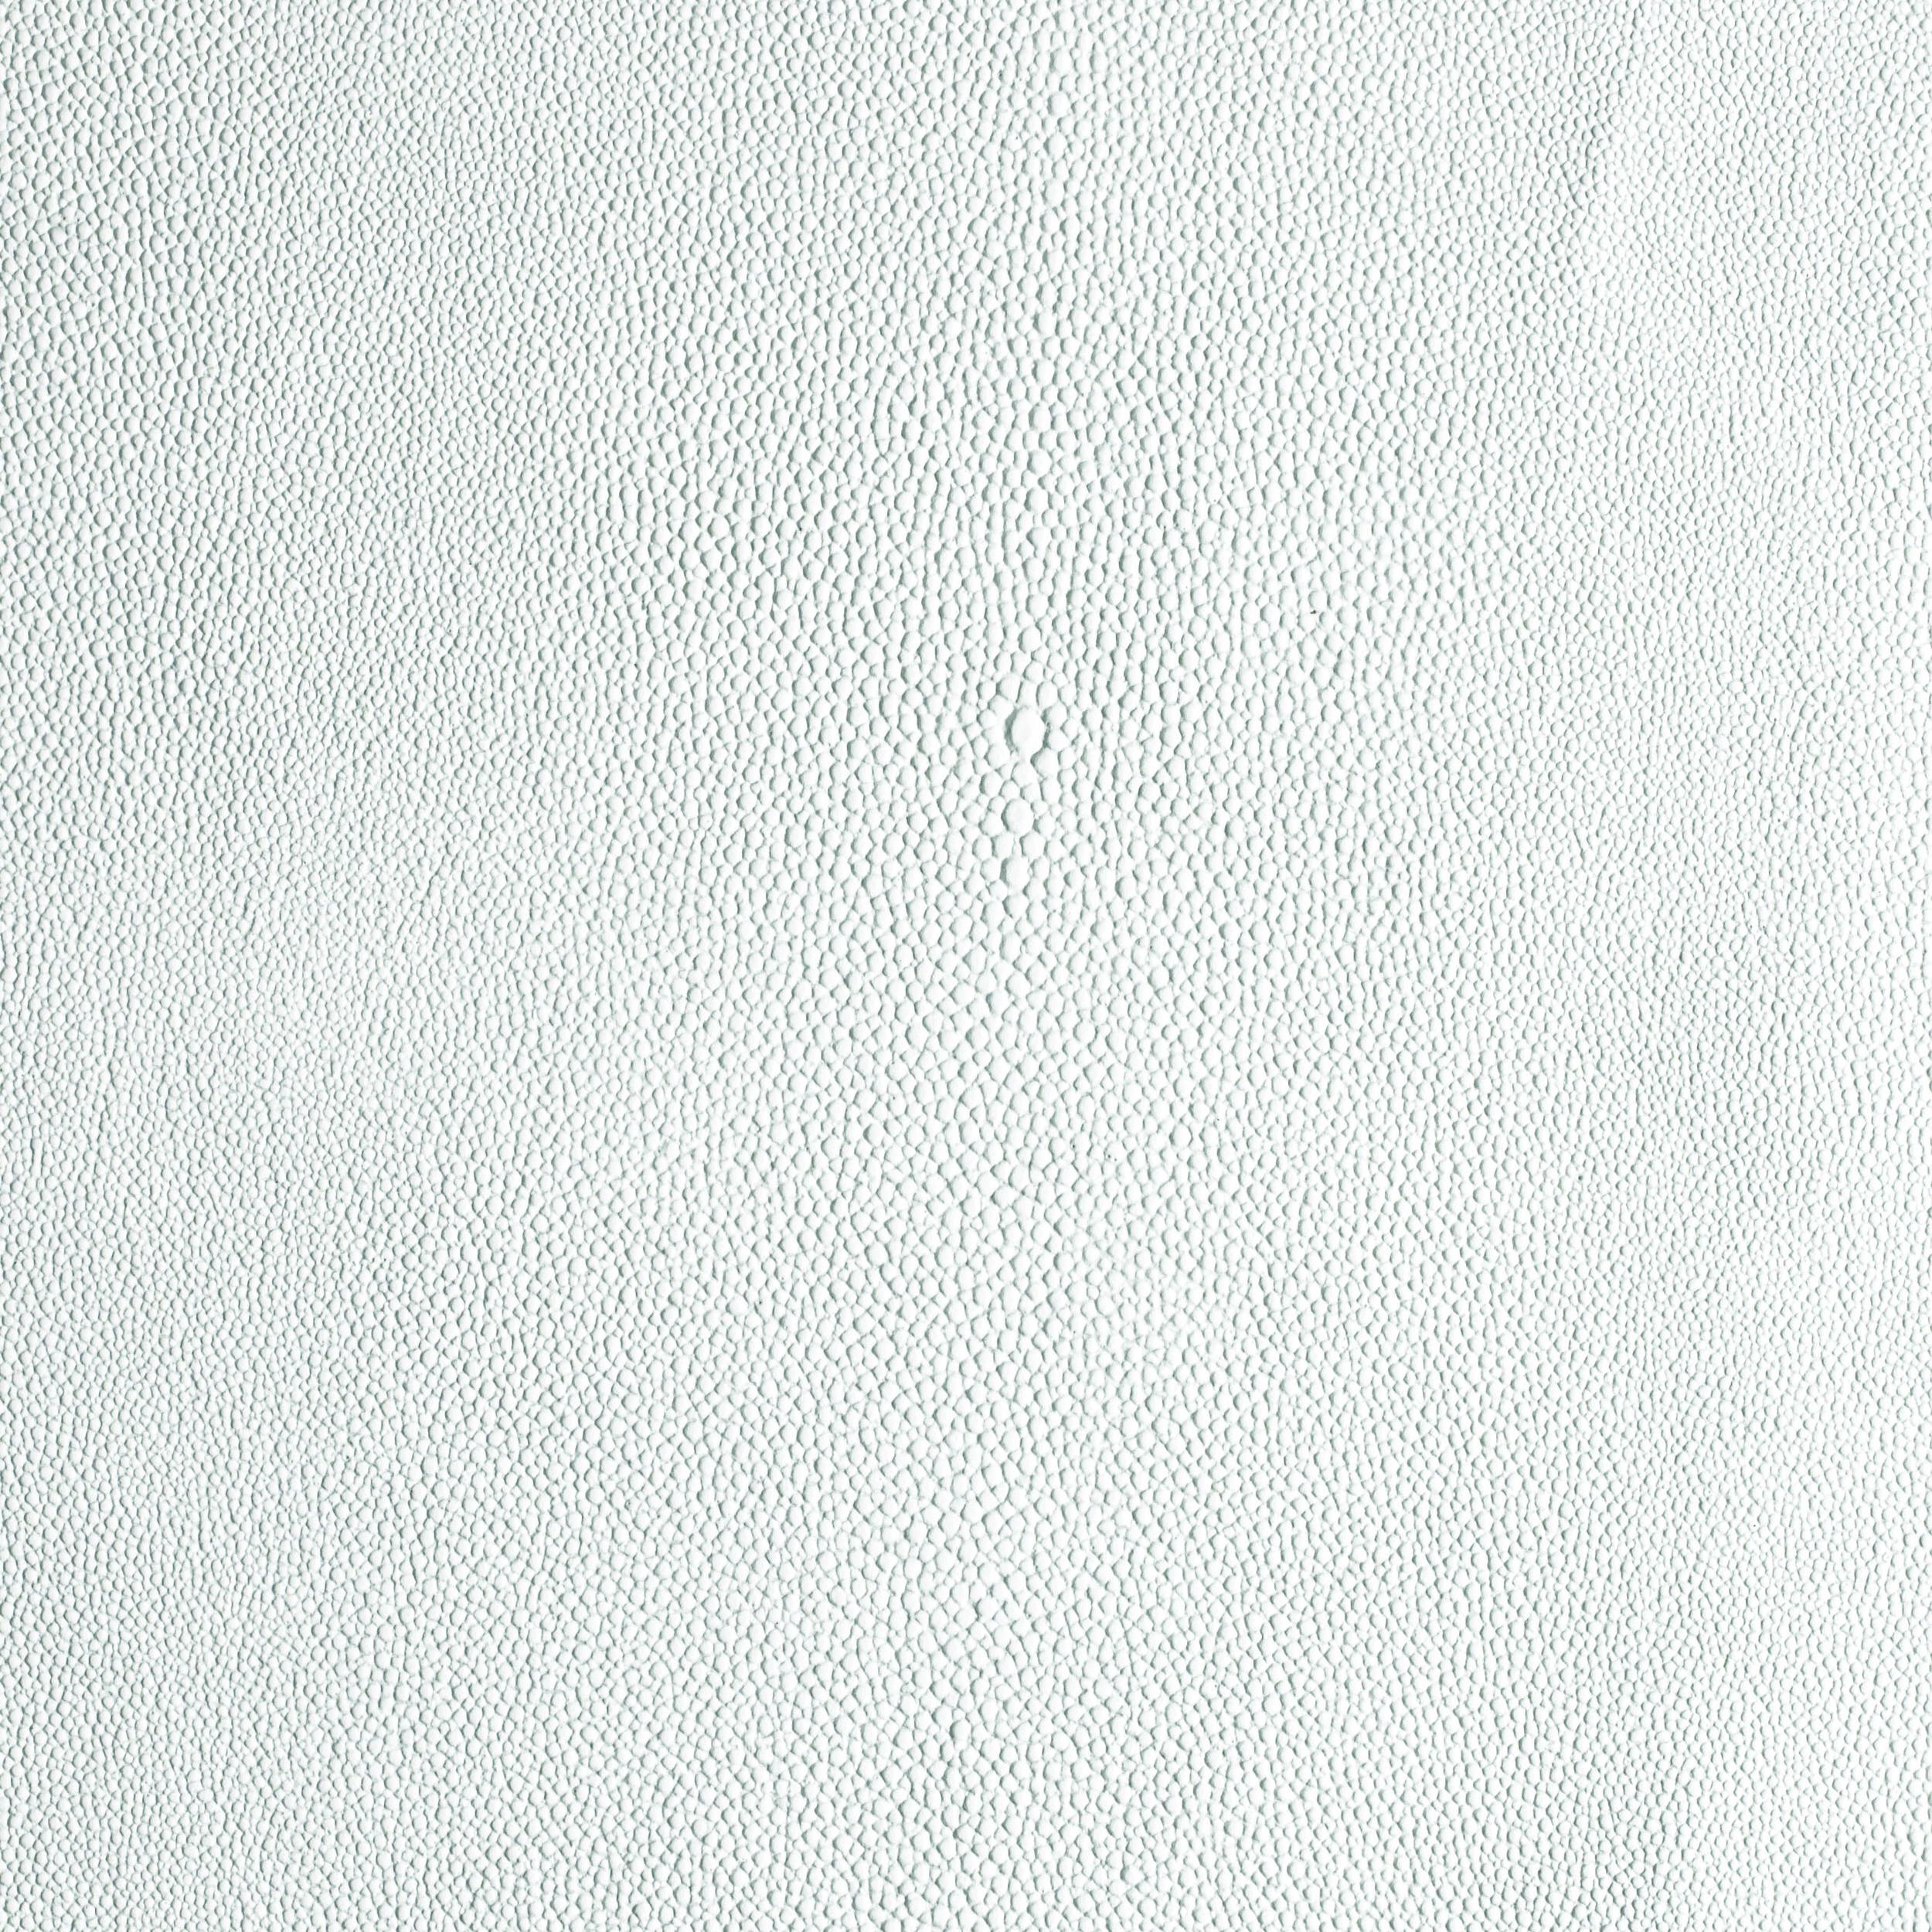 Bianco HS1004.jpg